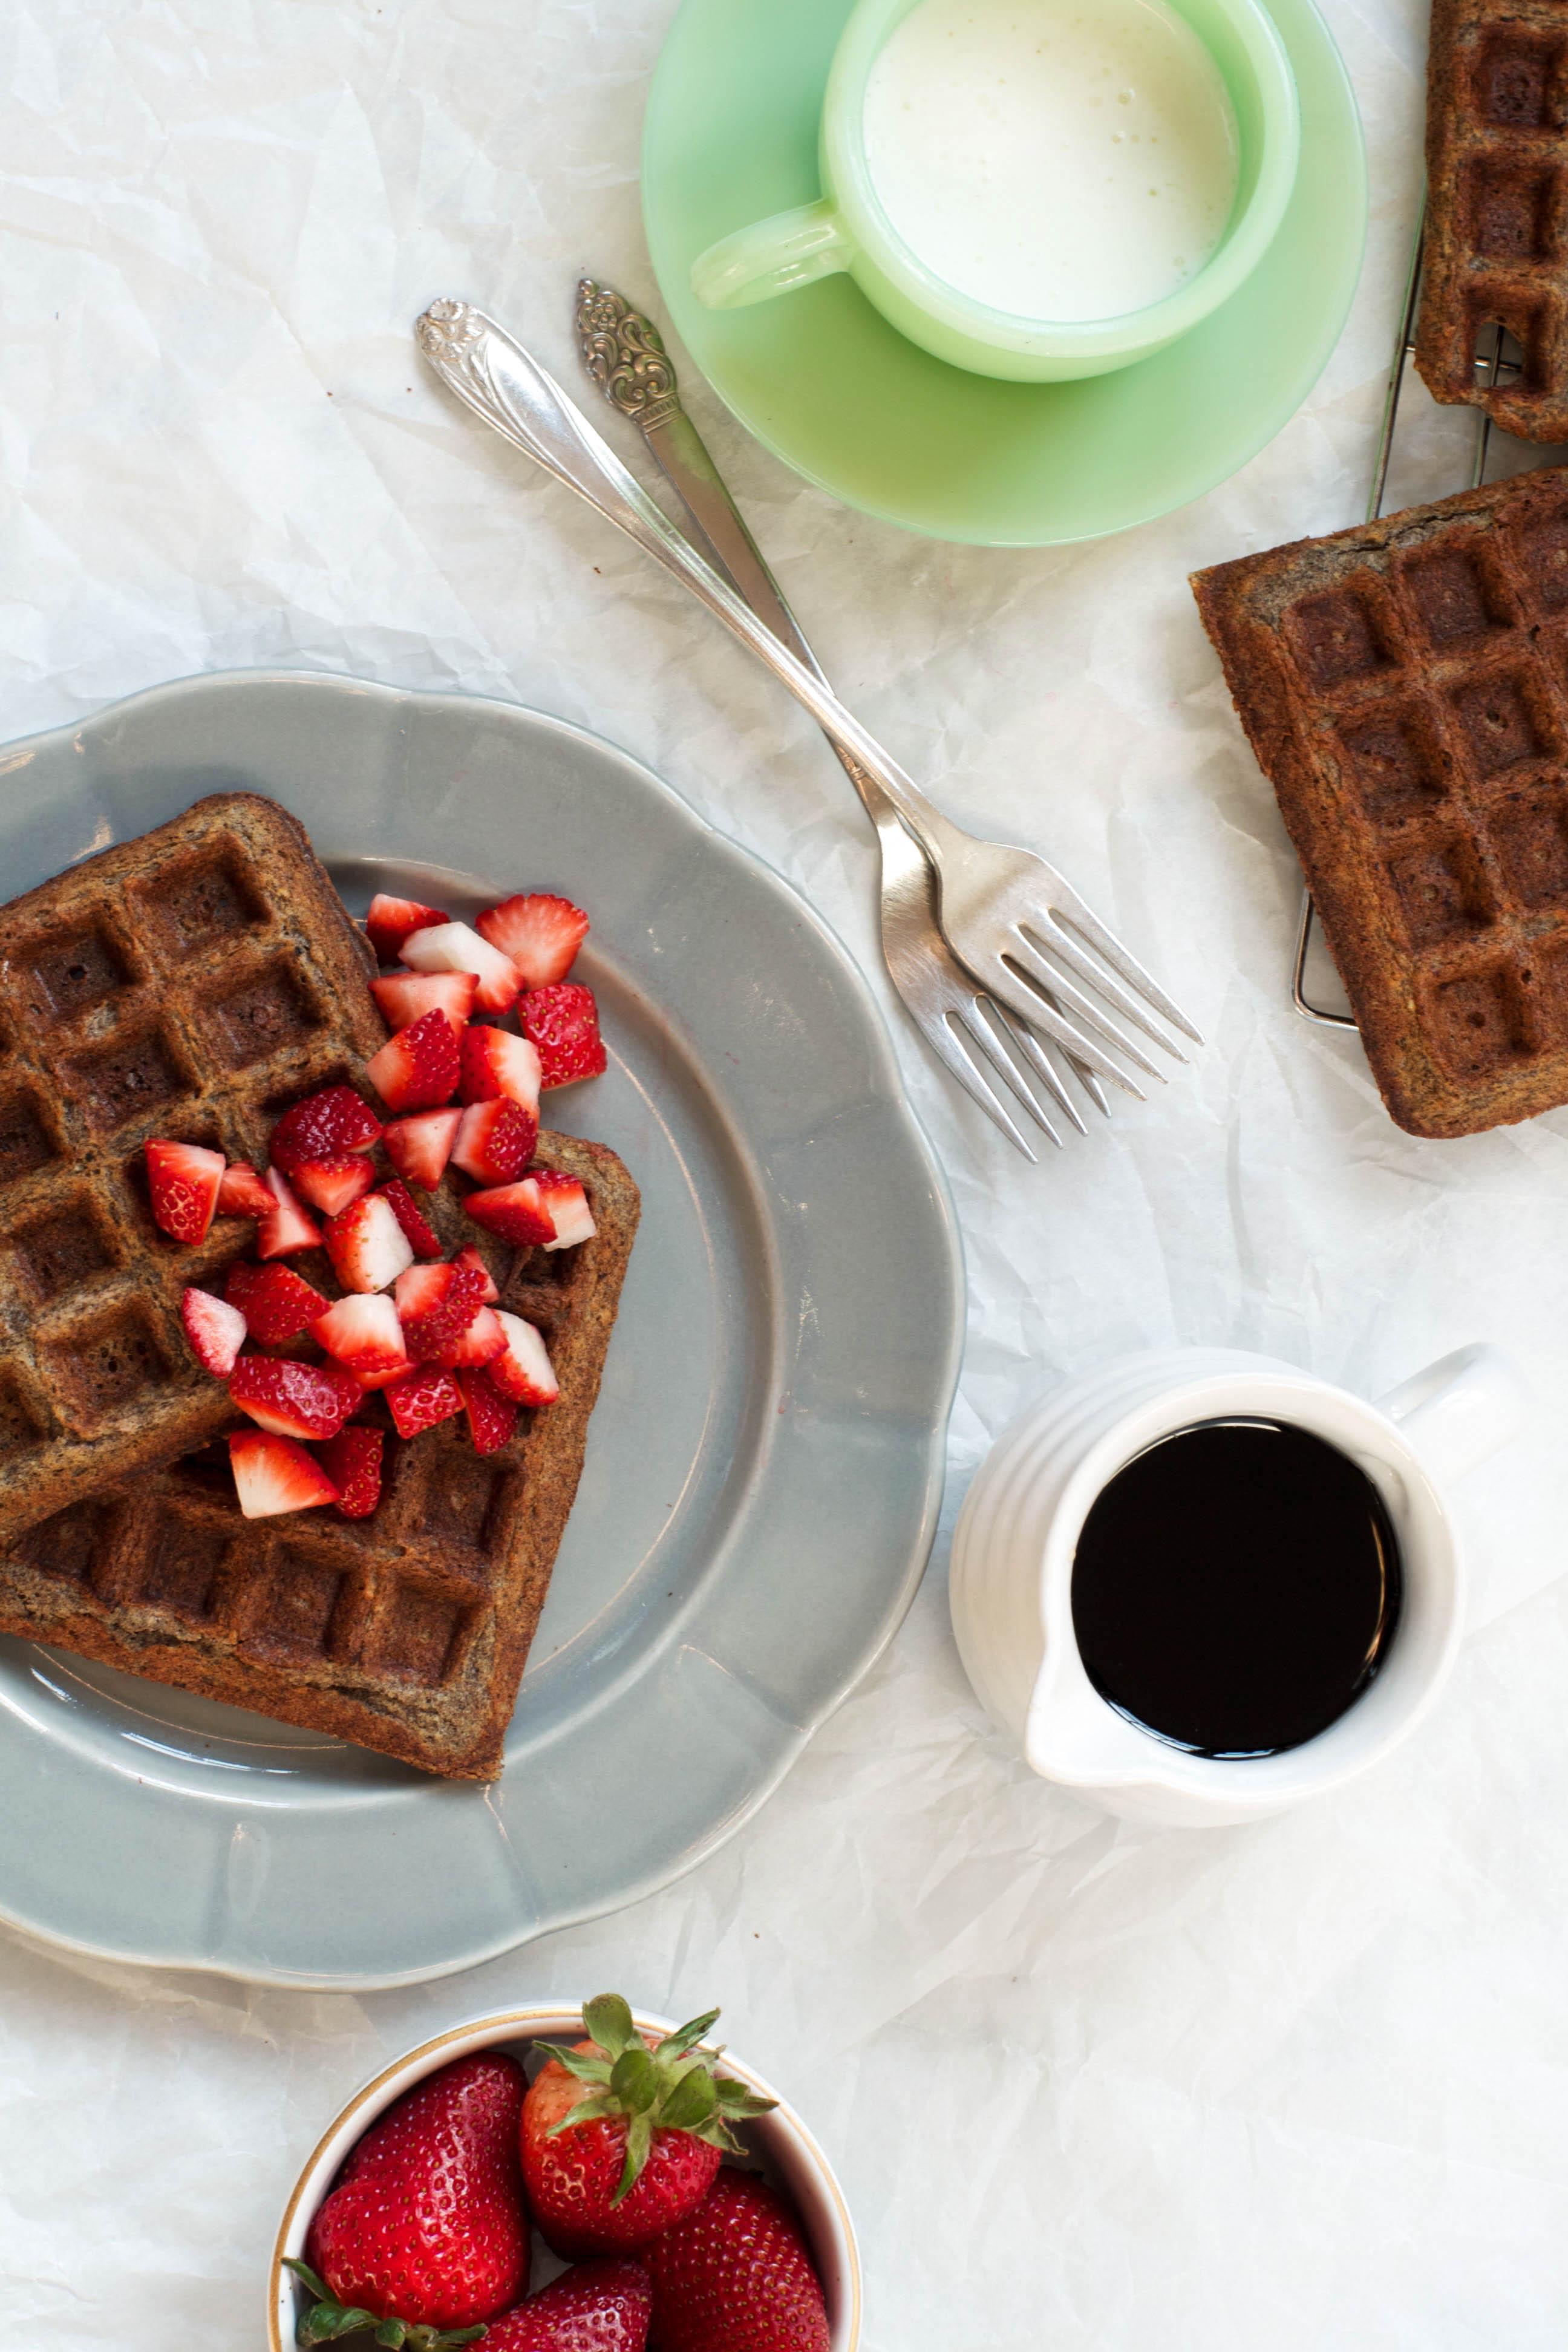 Gluten Free Buckwheat Waffles set on a gray plate with strawberries | Zestful Kitchen